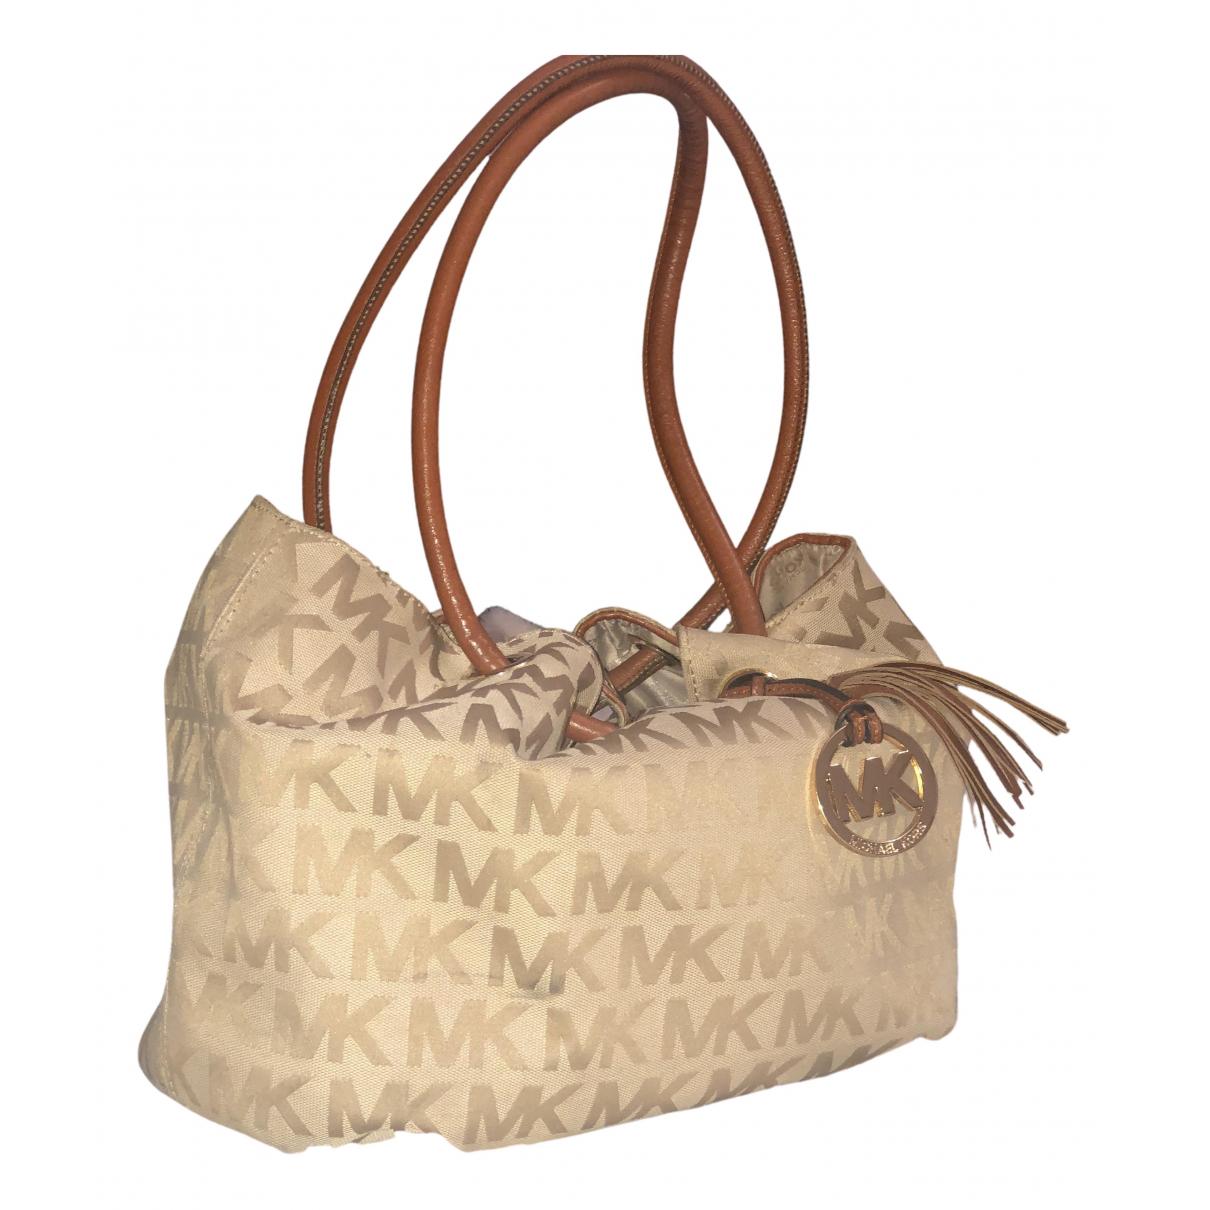 Michael Kors N Beige Cloth handbag for Women N